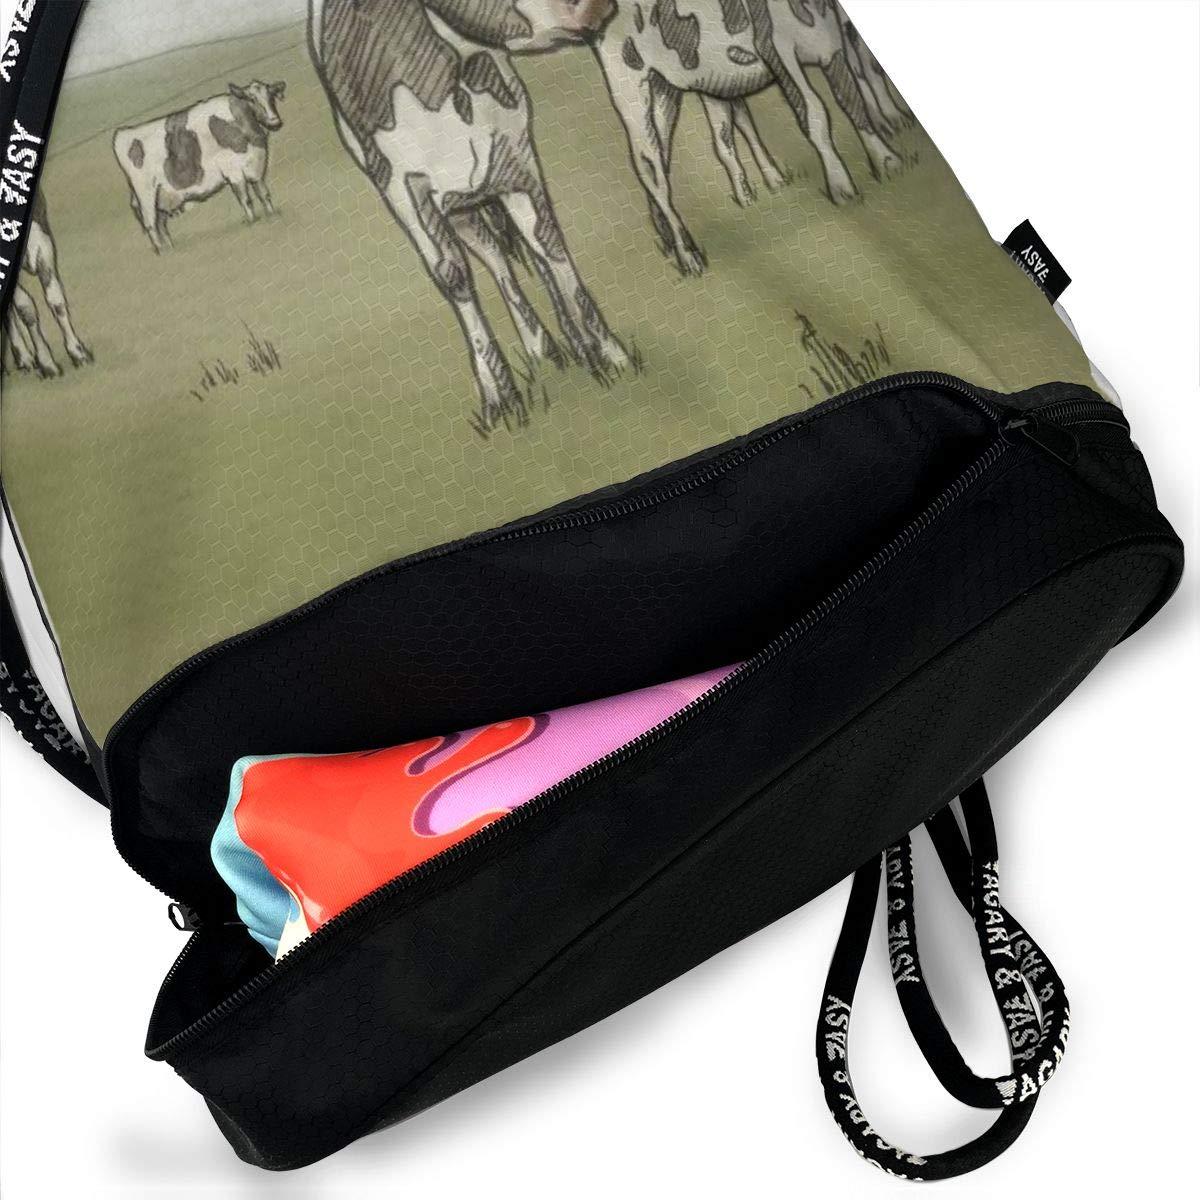 Gym Yoga Runner Sports Daypack Portable Bundle Backpack Cool Tiger In Flame Drawstring Bag For Girls /& Boys